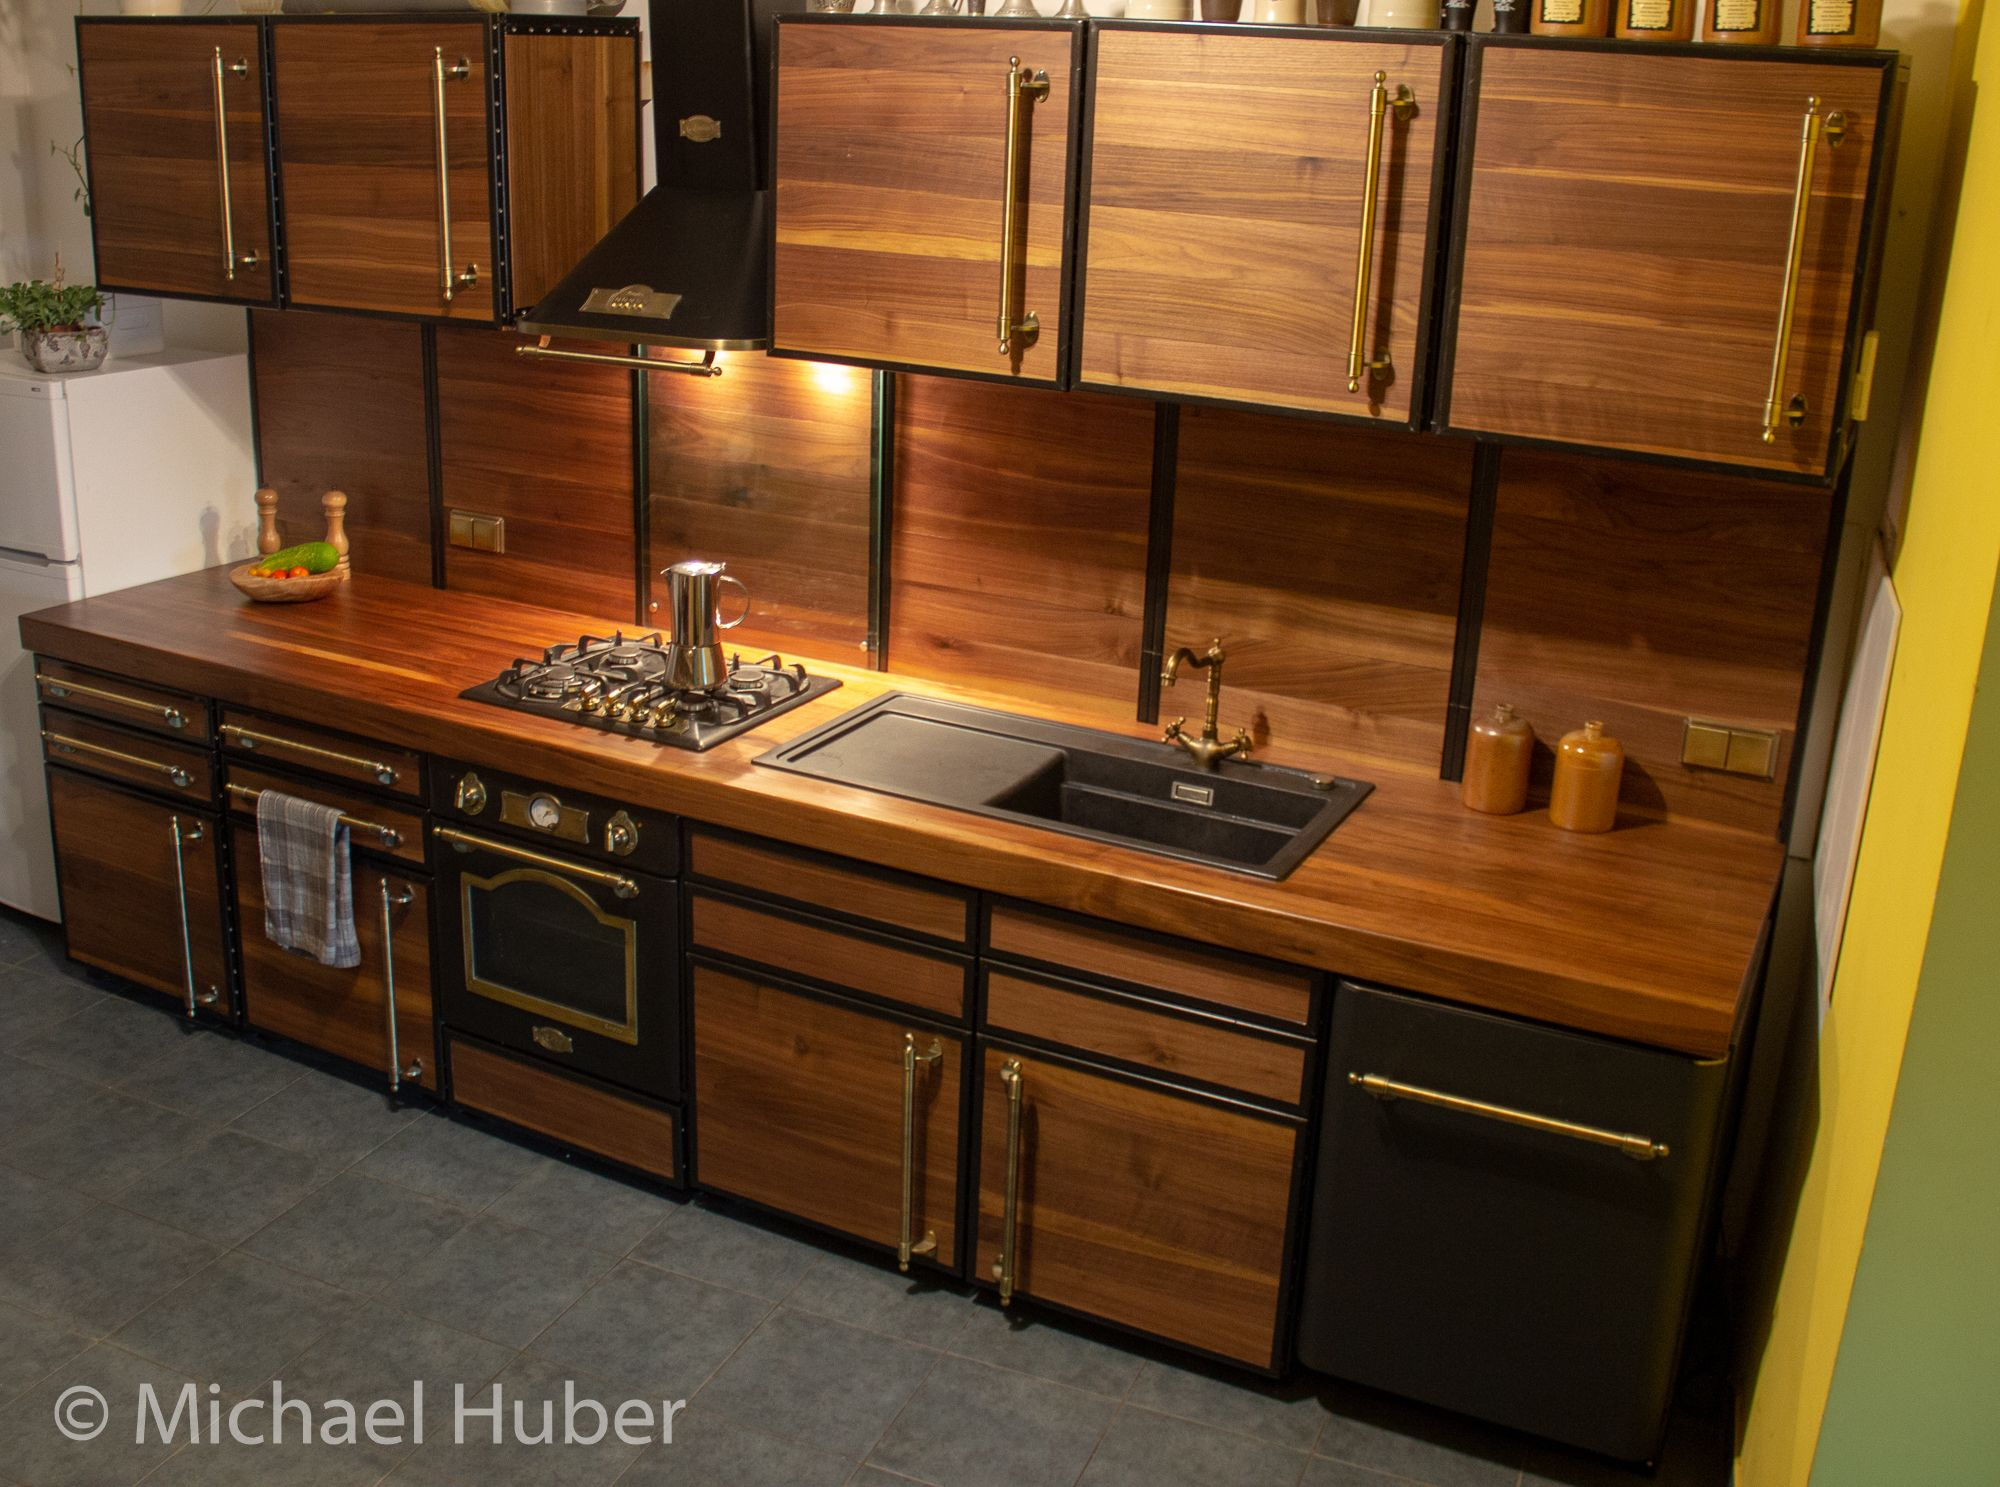 Kitchen Made Of Welded Steel Frames With Sanded Walnut Boards And A 2 4 Solid Walnut W Framed Kitchen Cabinets Functional Kitchen Design Steel Frame Furniture